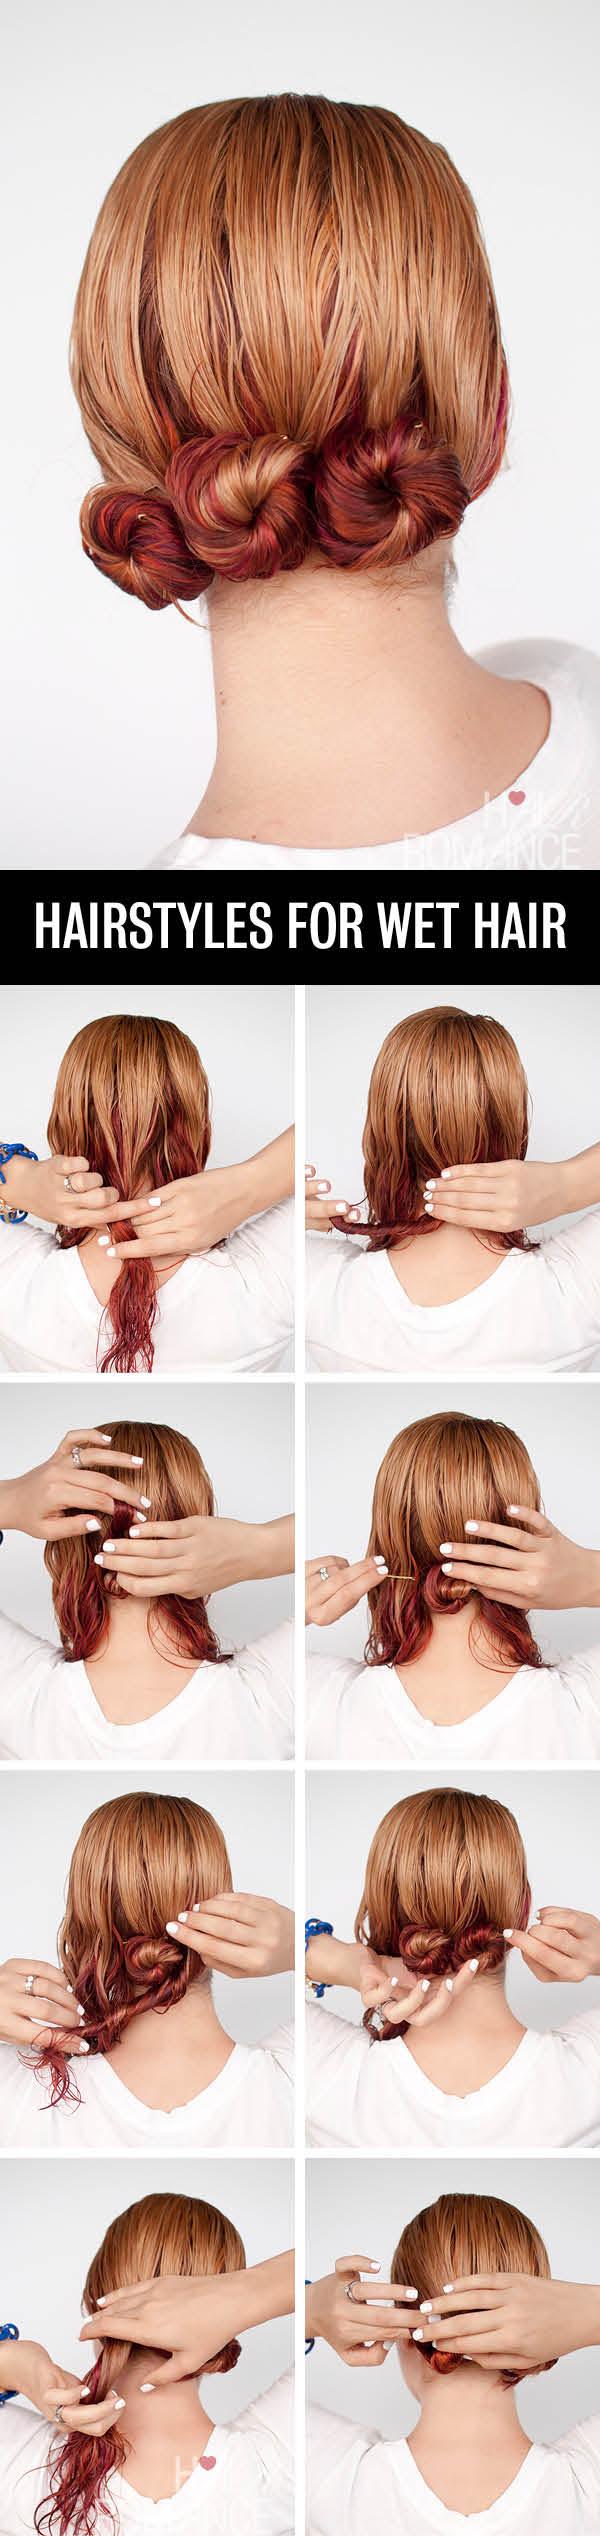 Hair-Romance-Hairstyle-tutorials-for-wet-hair-the-low-twist-bun